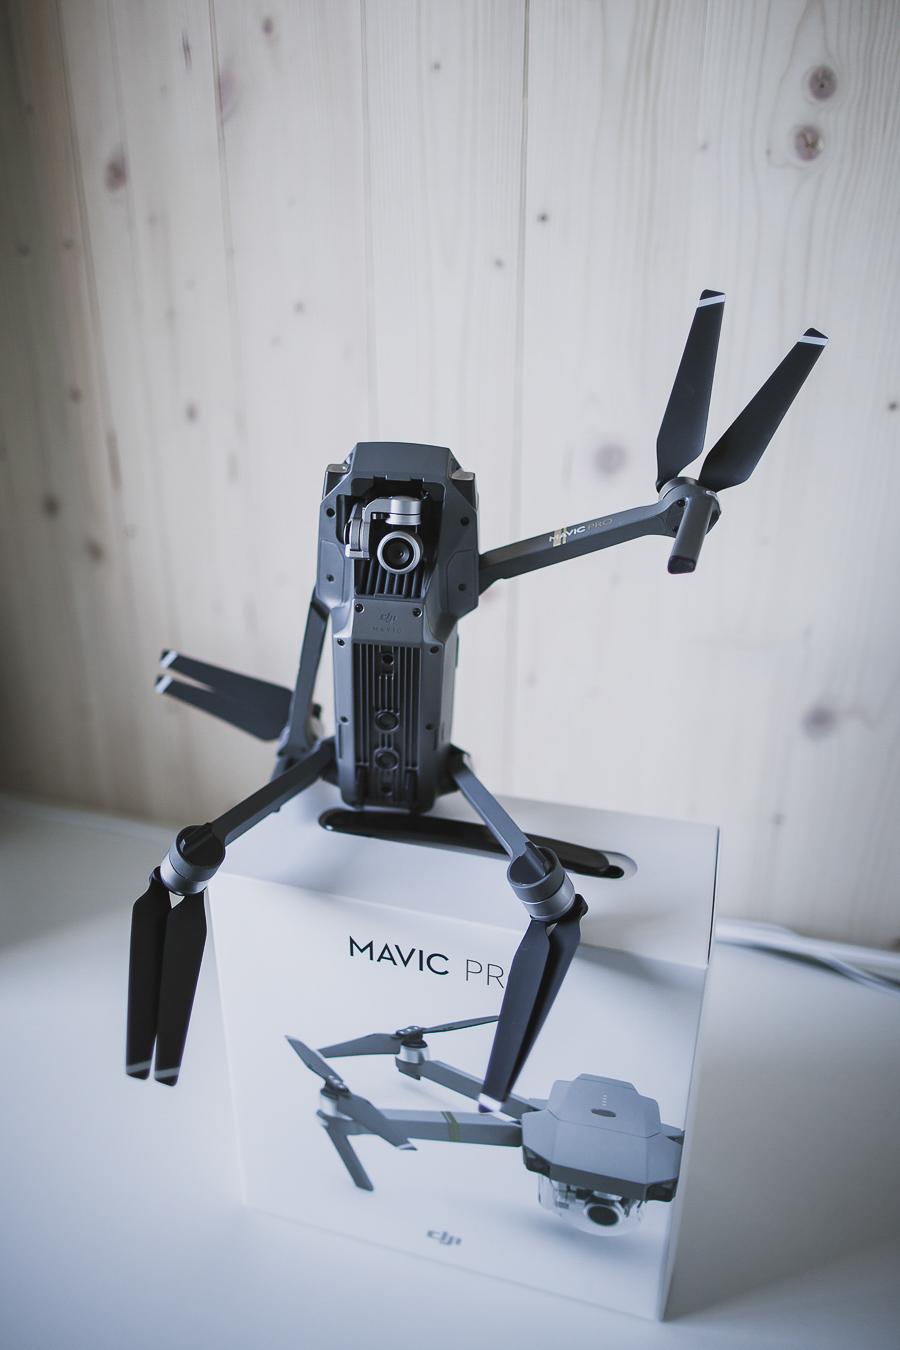 Drone waving